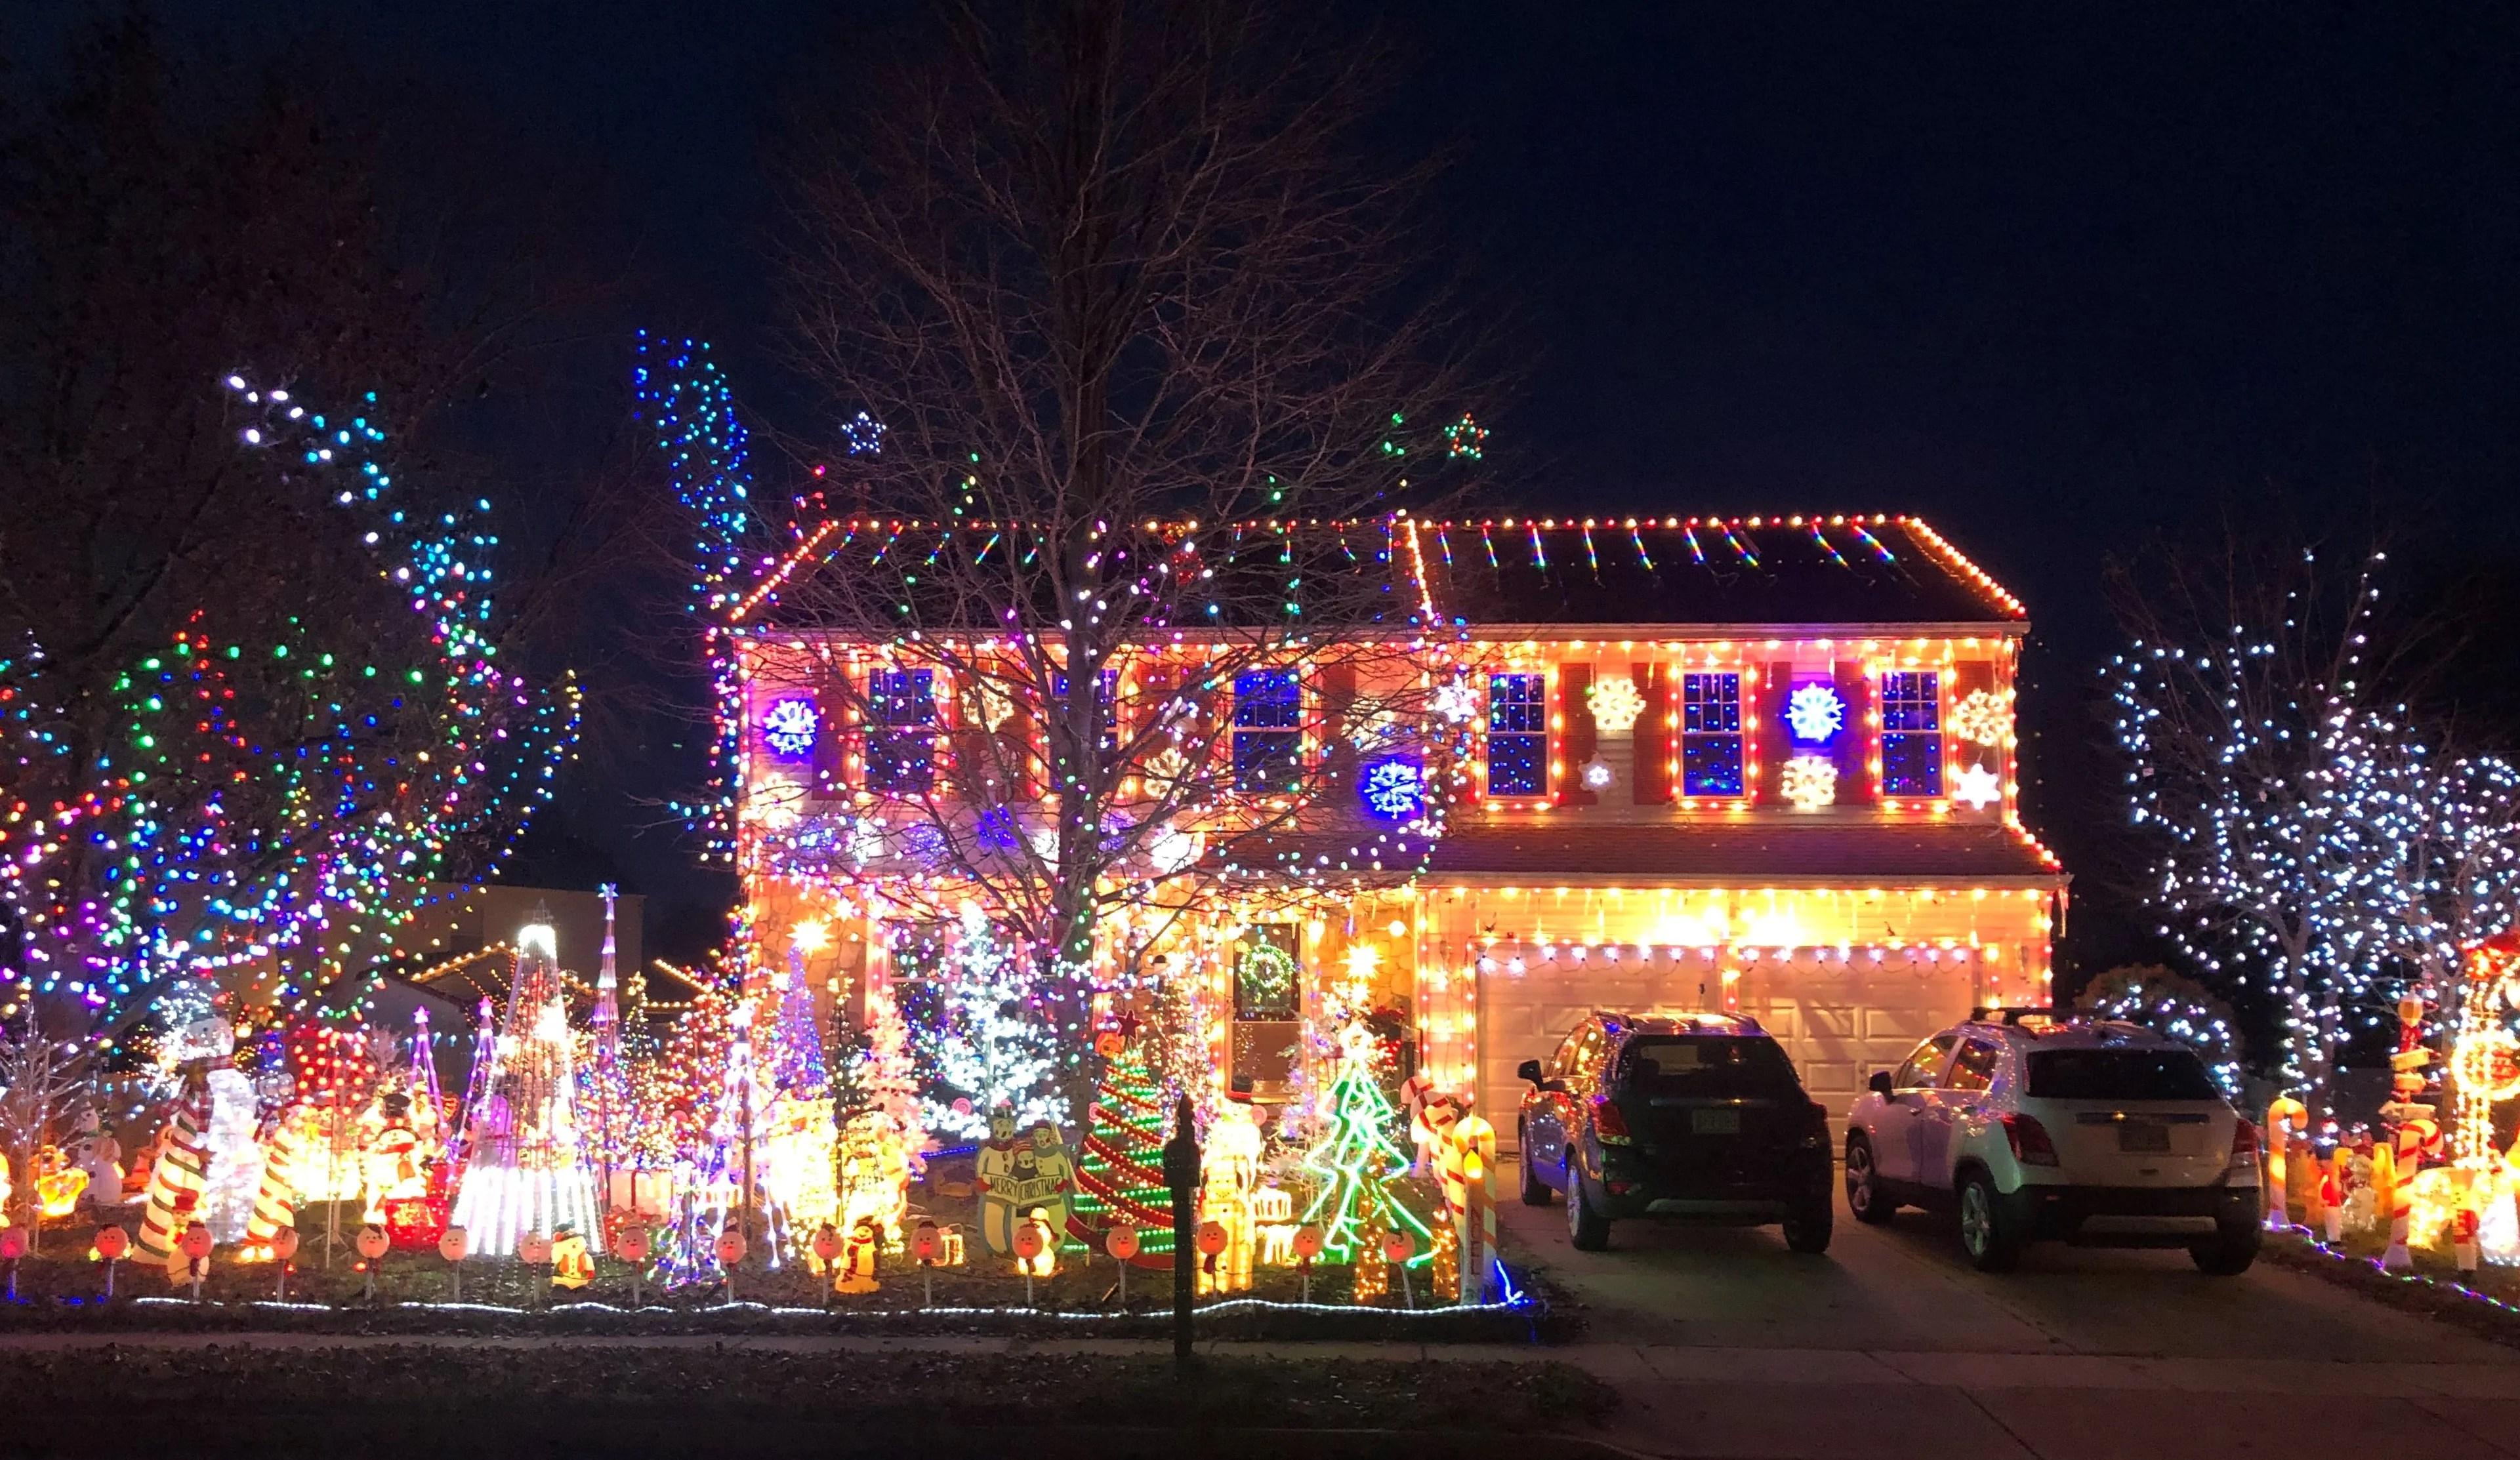 Christmas lights 2018 Find best NJ home displays using